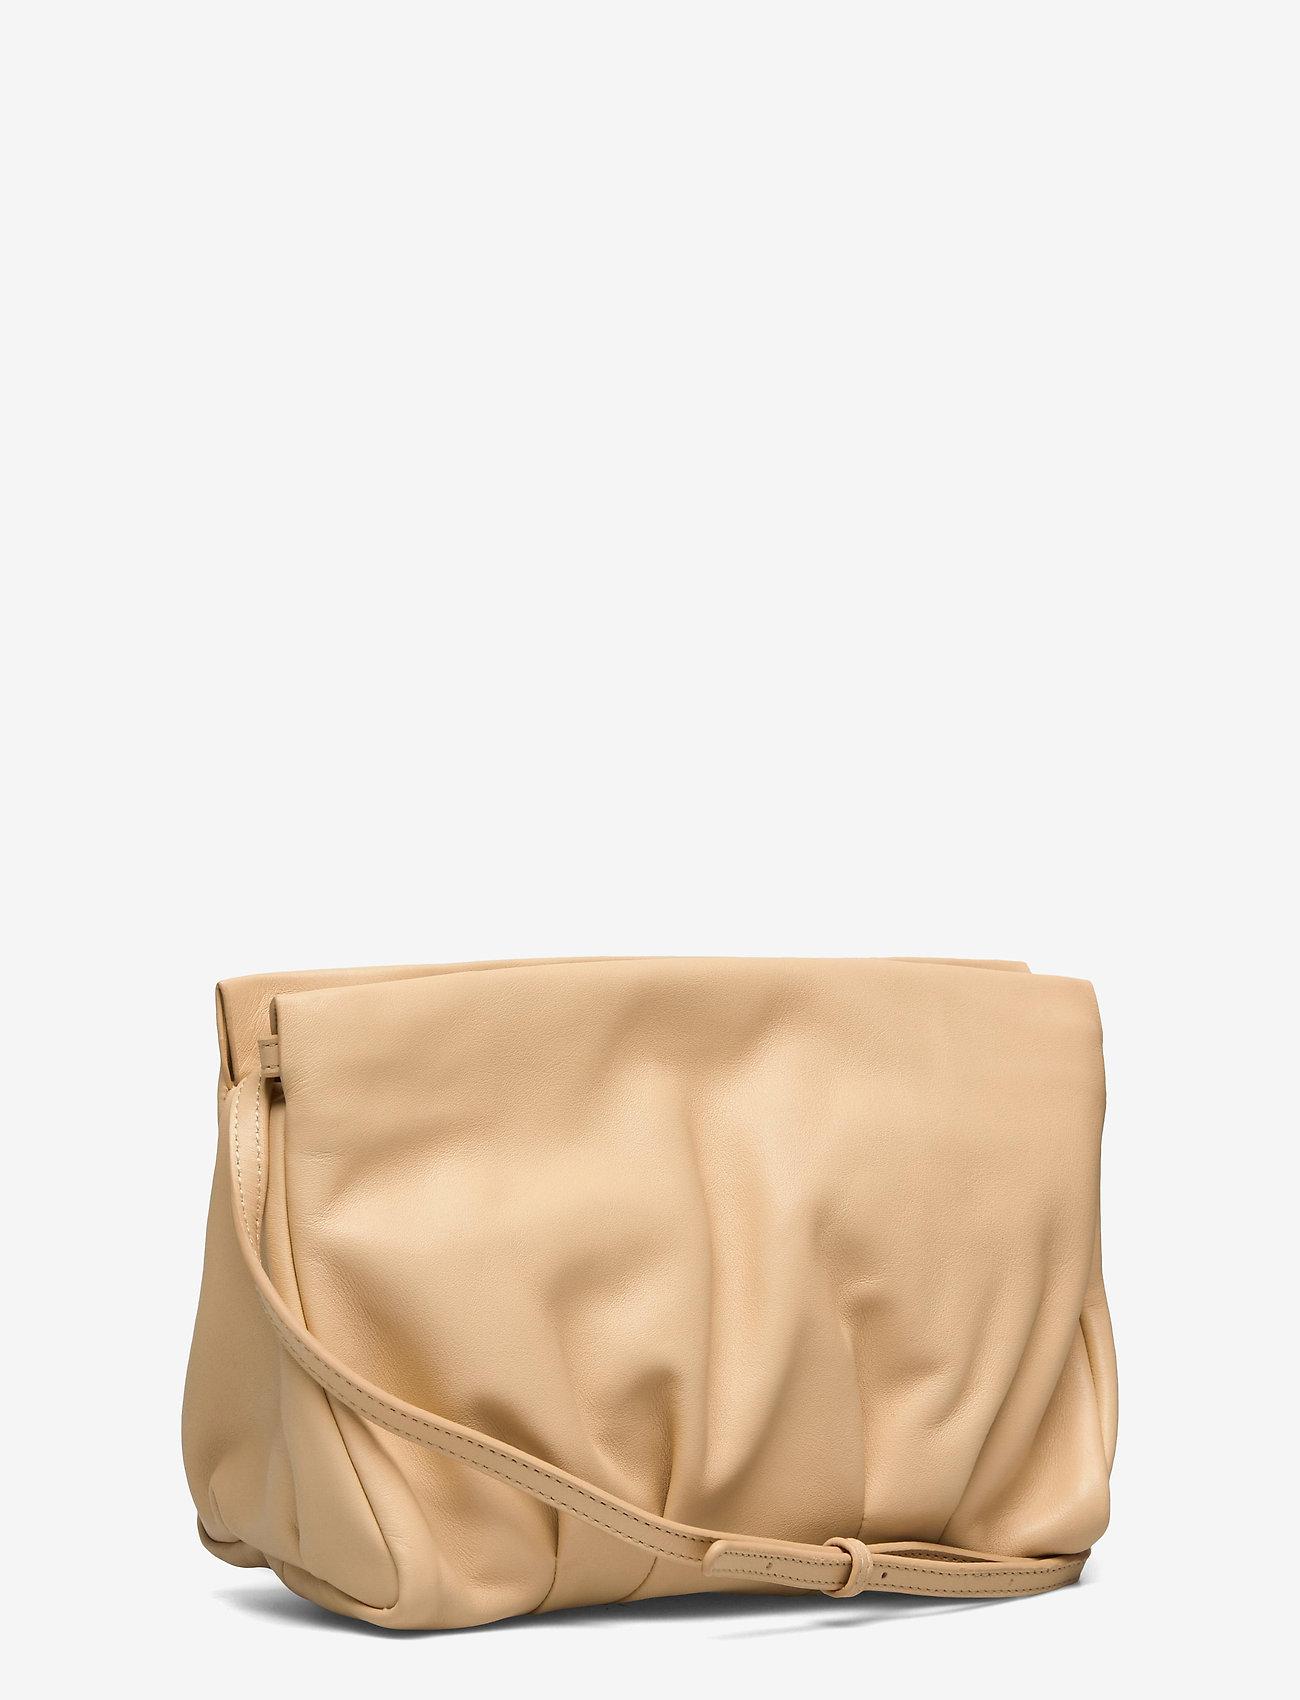 VAGABOND - RIO - crossbody bags - butter - 2